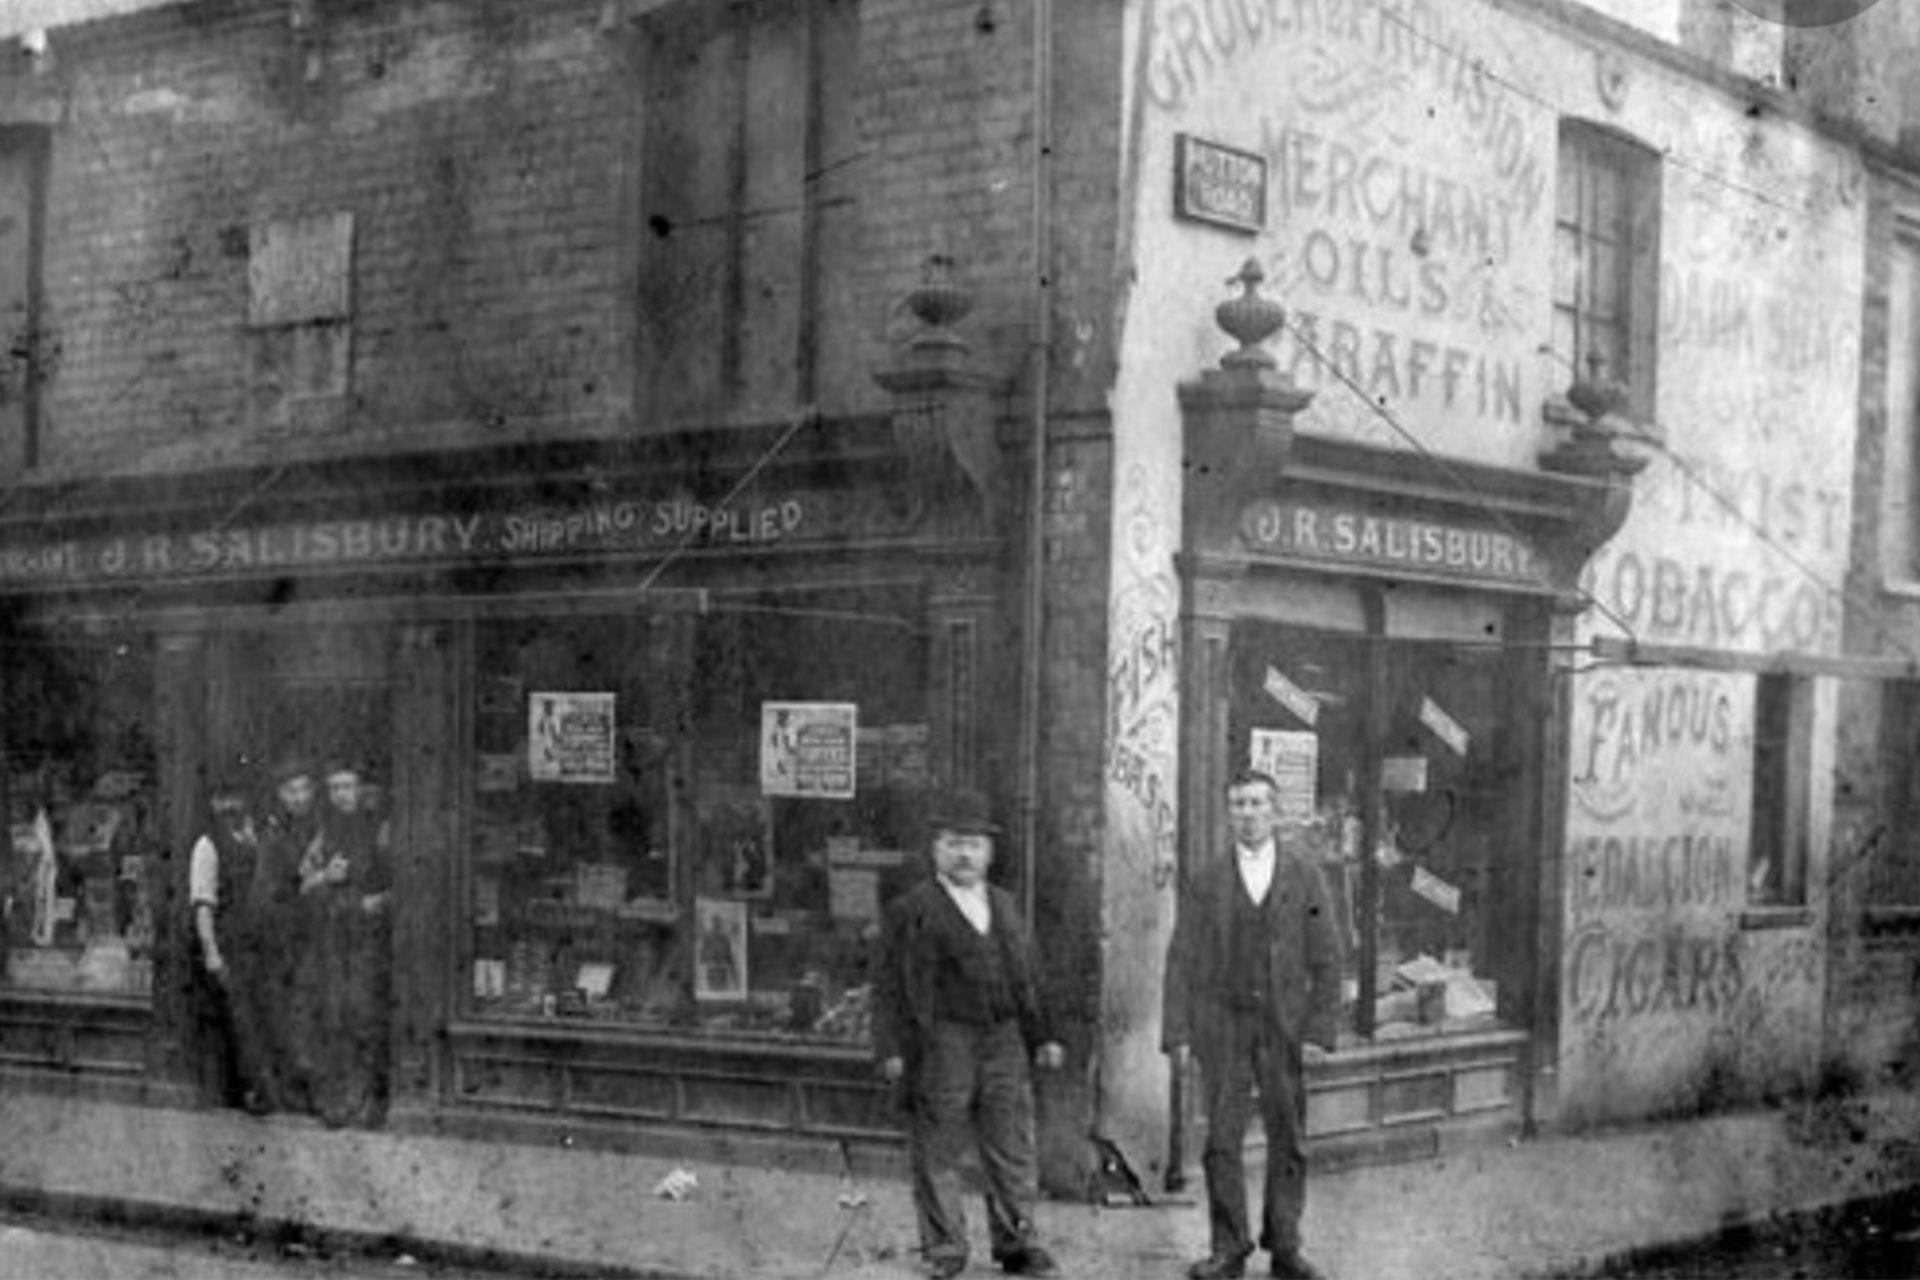 Salsburys Caterers 1910